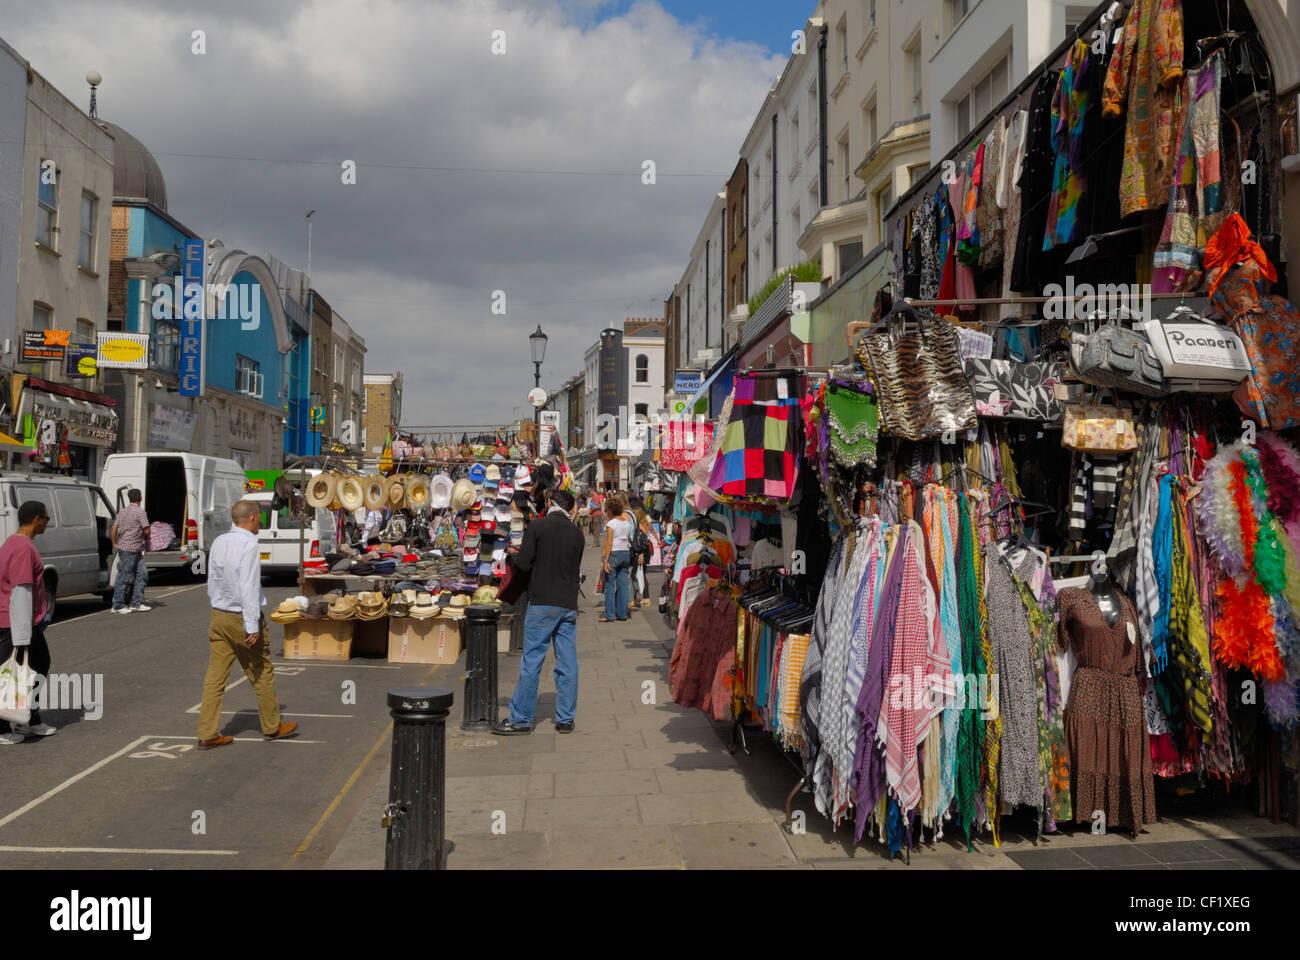 Market stalls in Portobello Road. Portobello Road is famous for its street market. - Stock Image